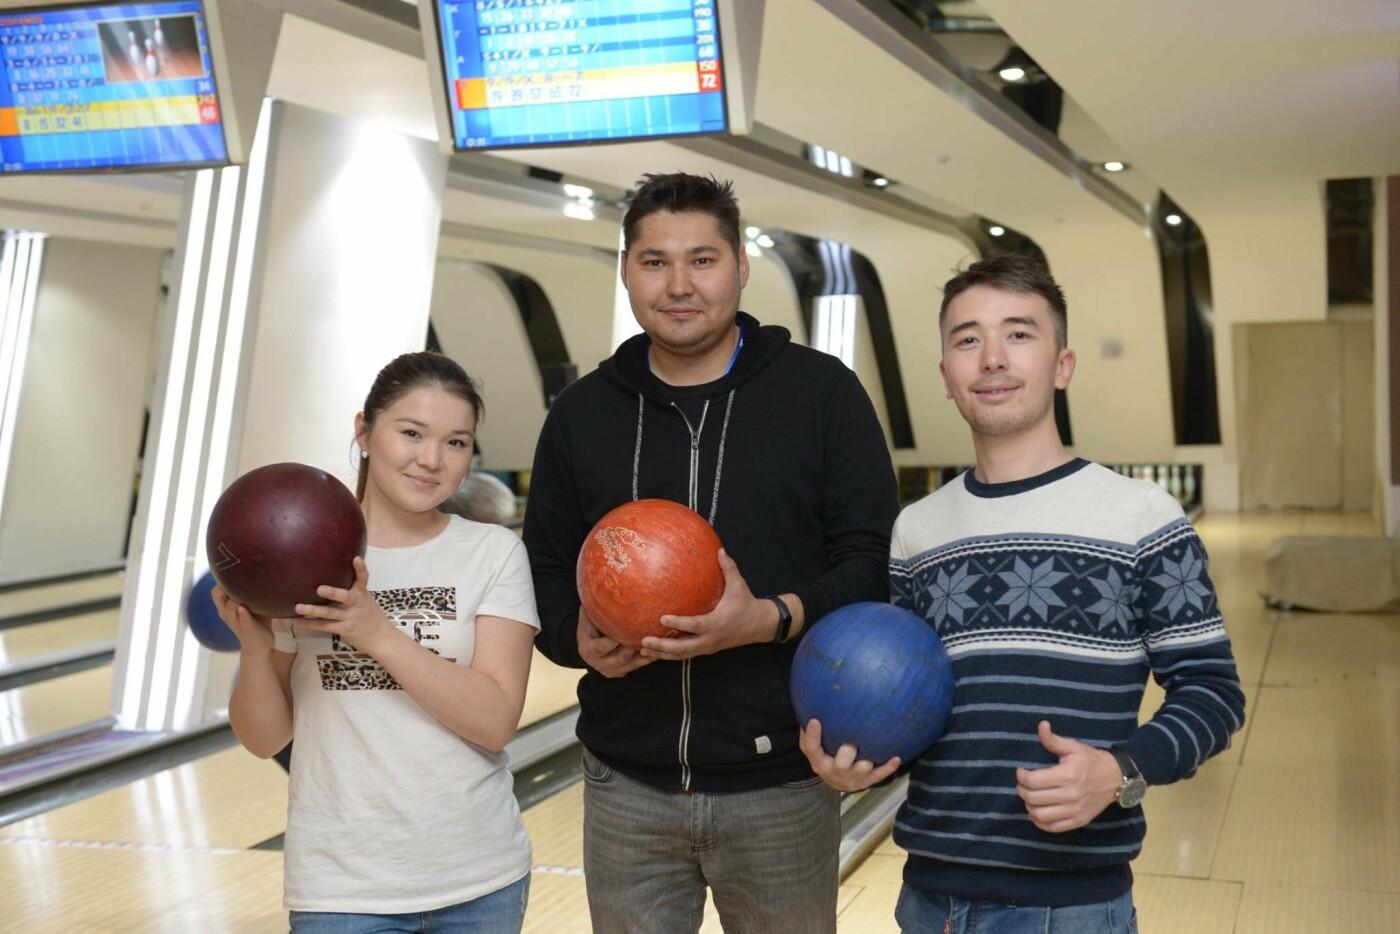 II турнир по боулингу среди журналистов прошел в Алматы (ФОТО), фото-17